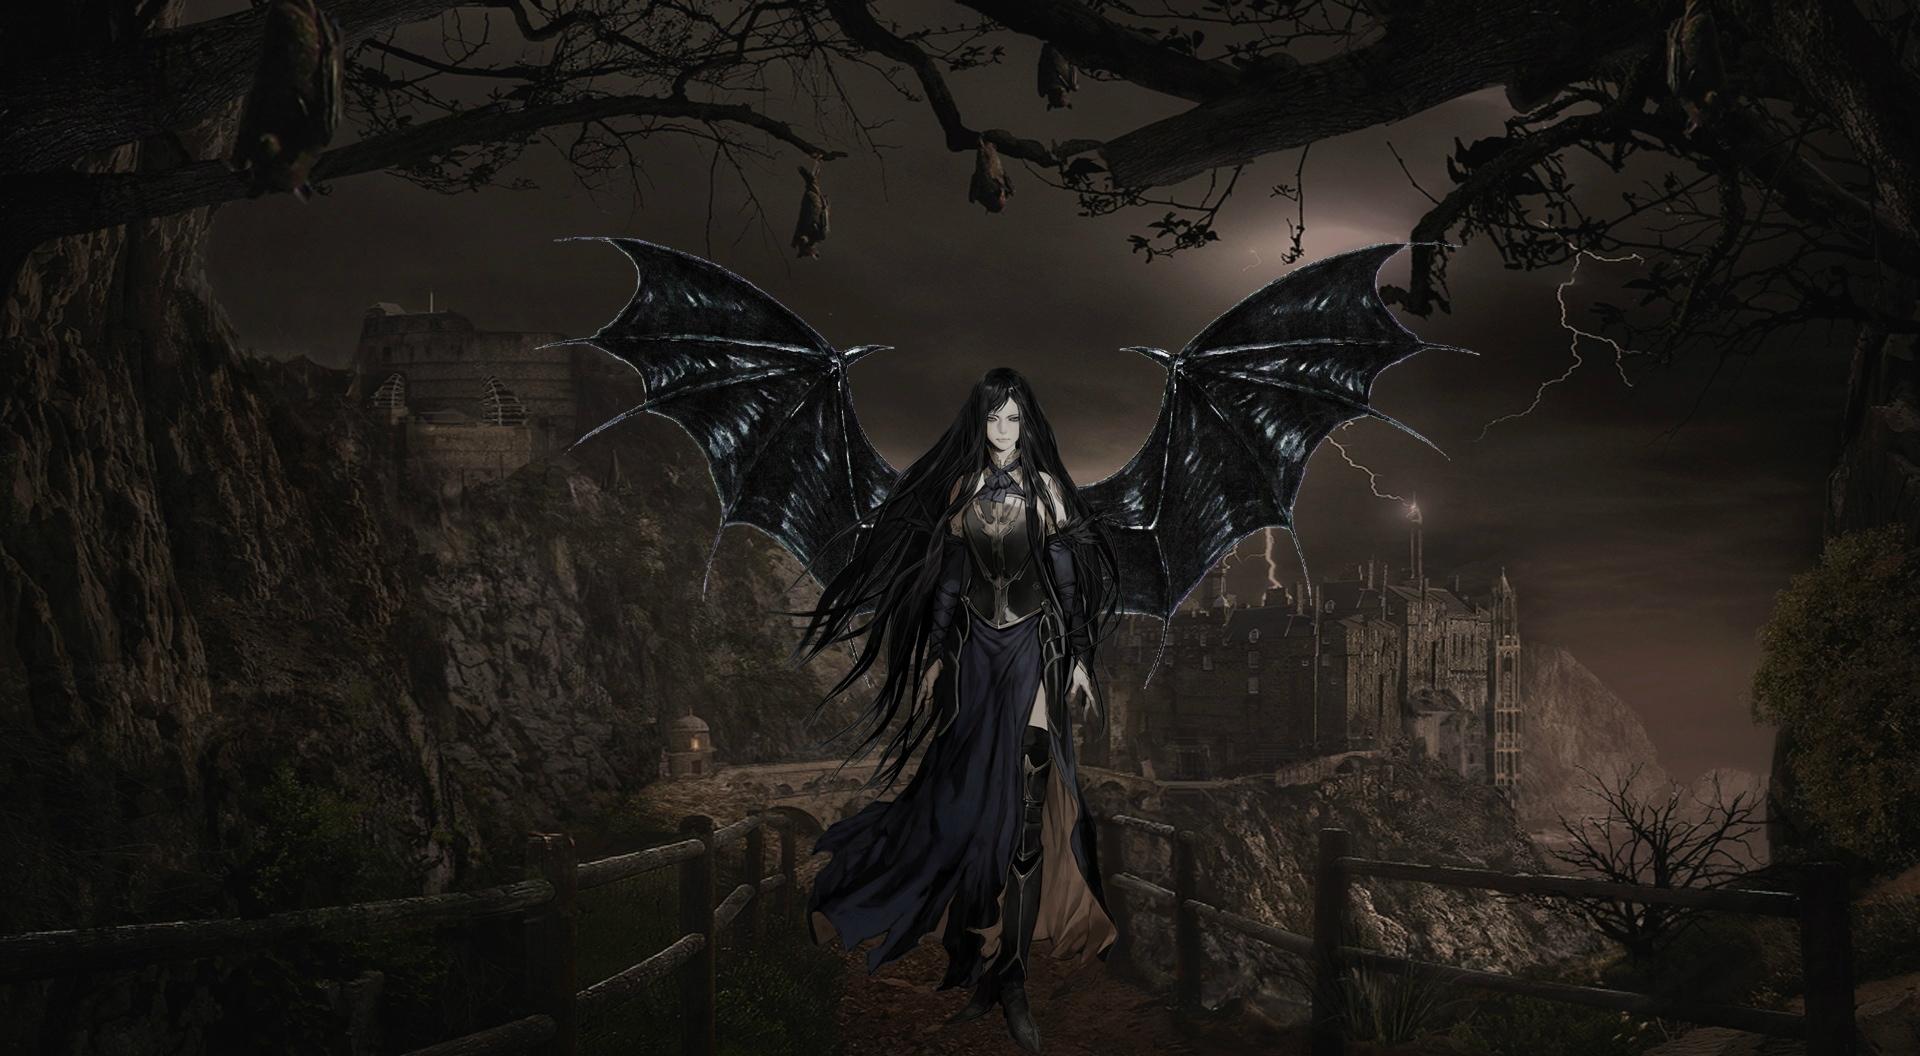 Evil Gothic Demon Wallpaper Demon wallpaper background 1920x1056